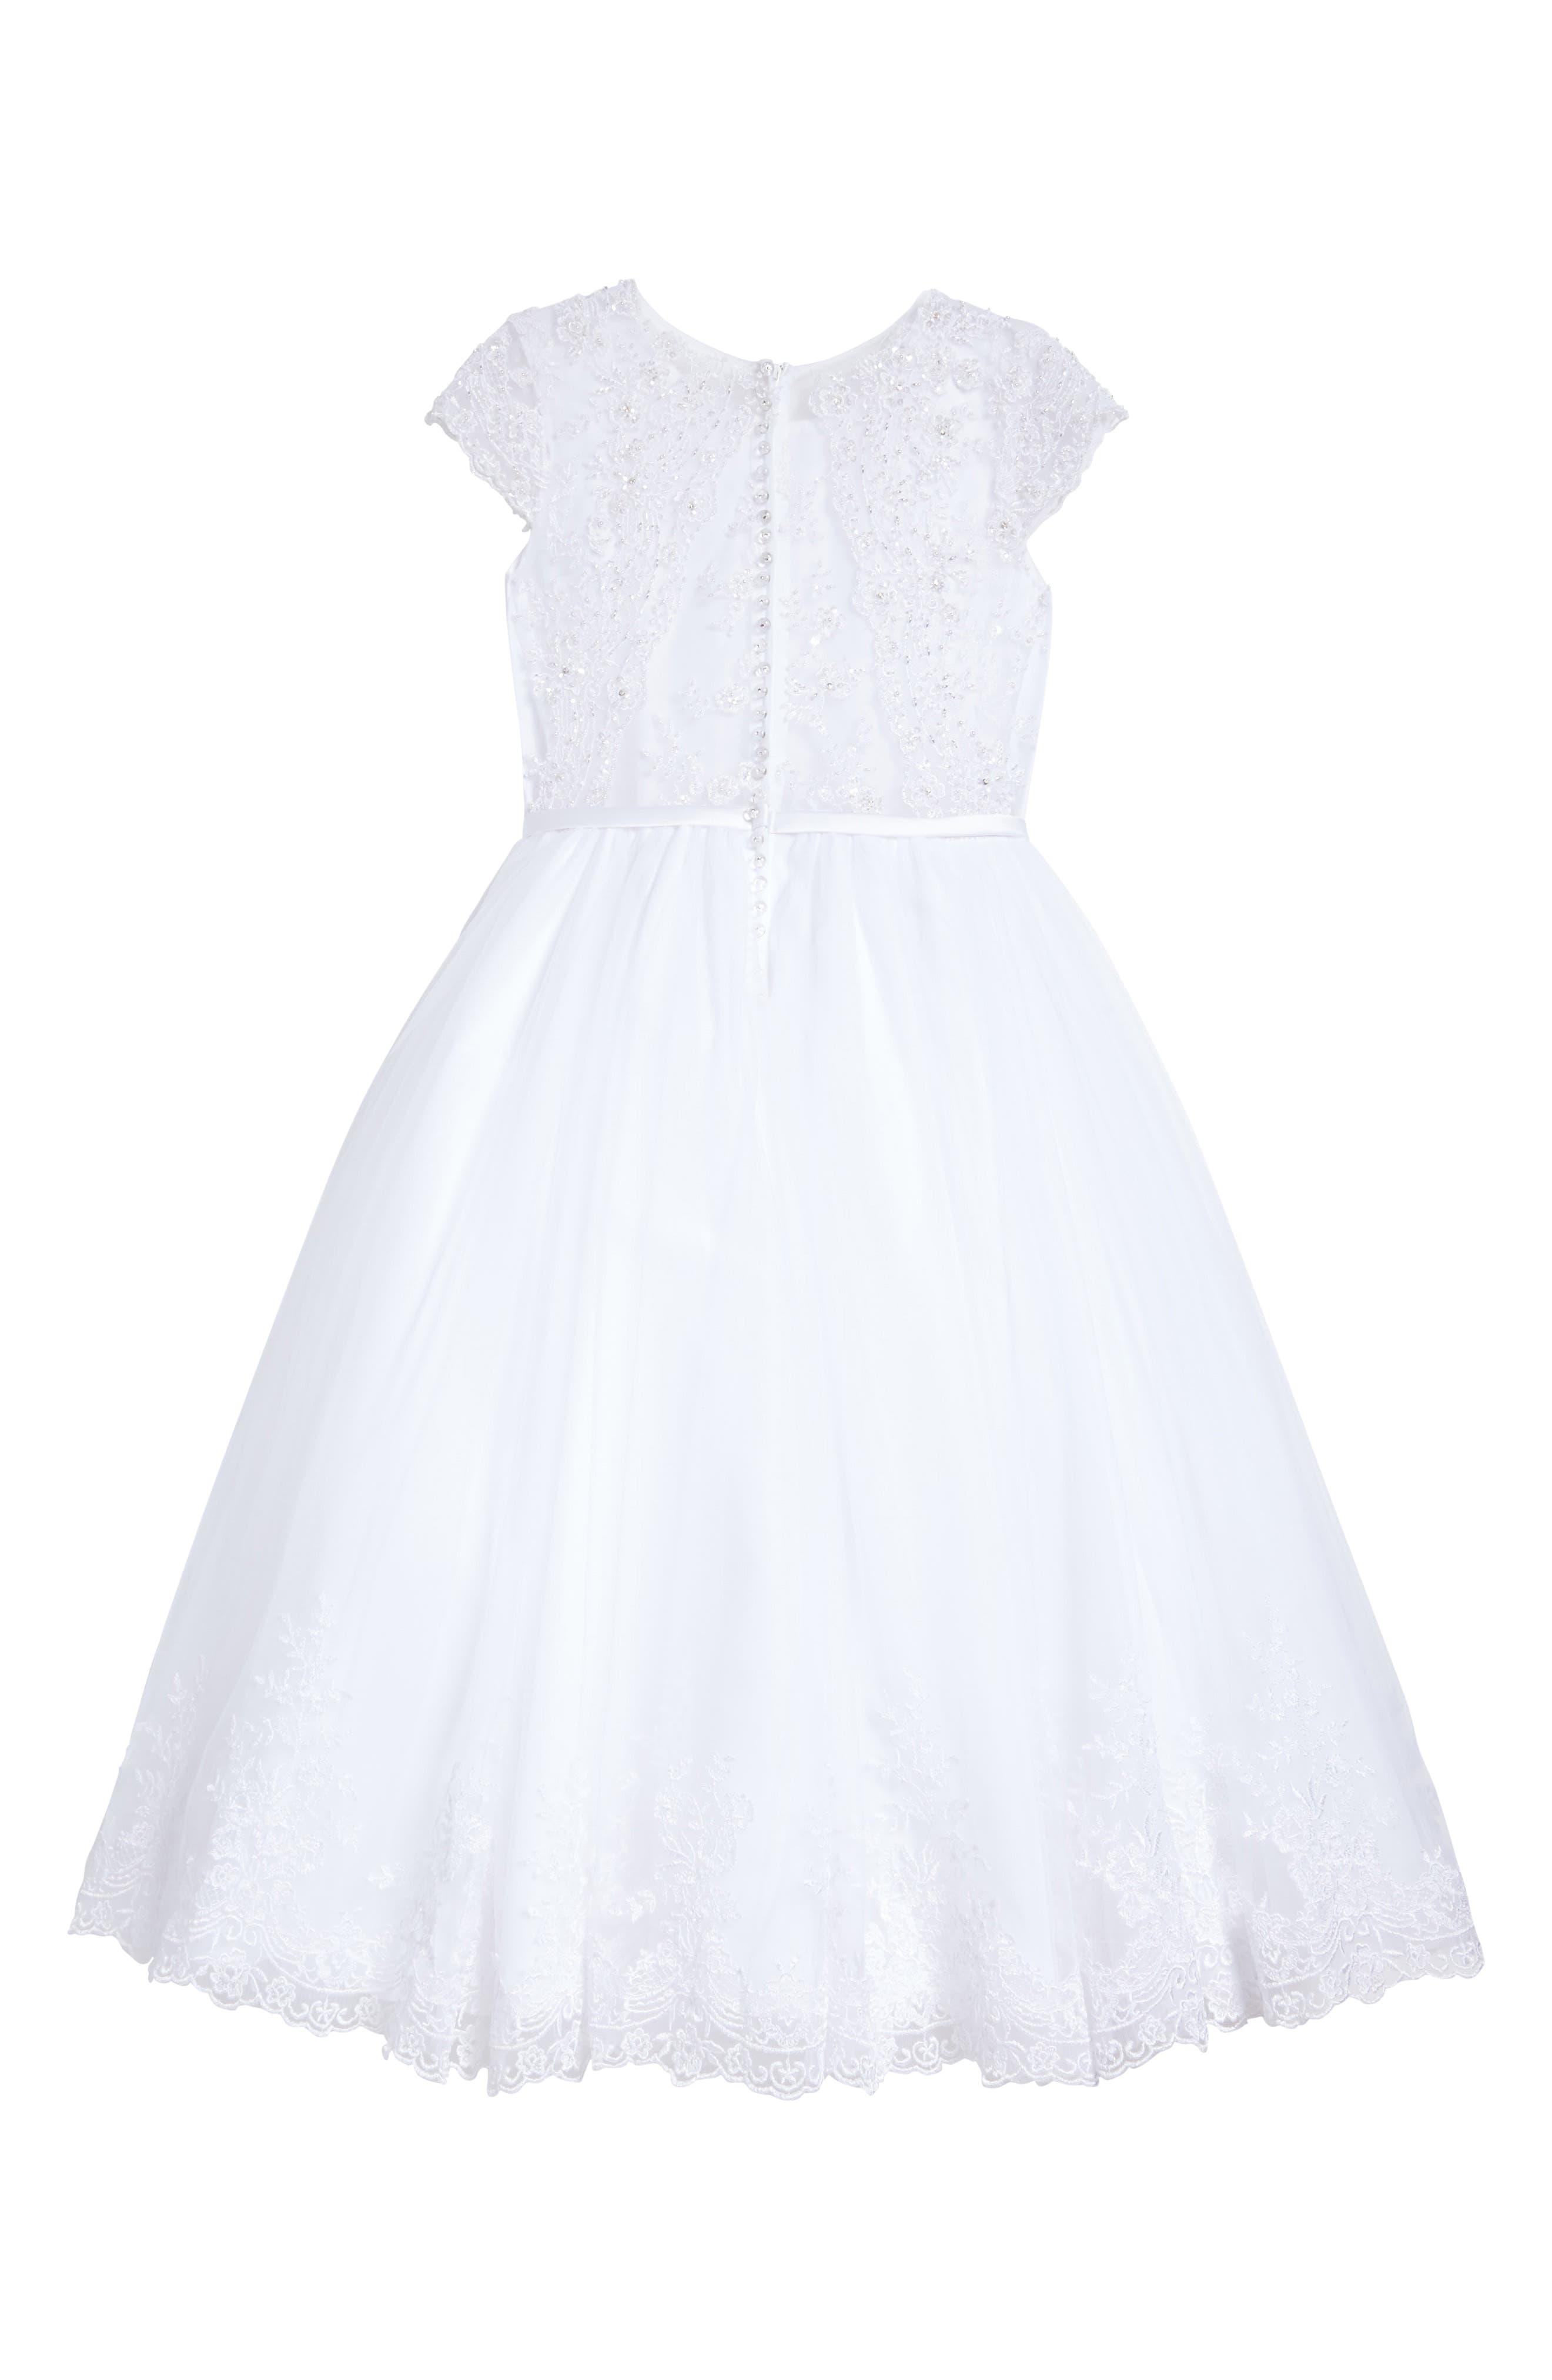 Beaded Satin & Tulle First Communion Dress,                             Alternate thumbnail 2, color,                             White